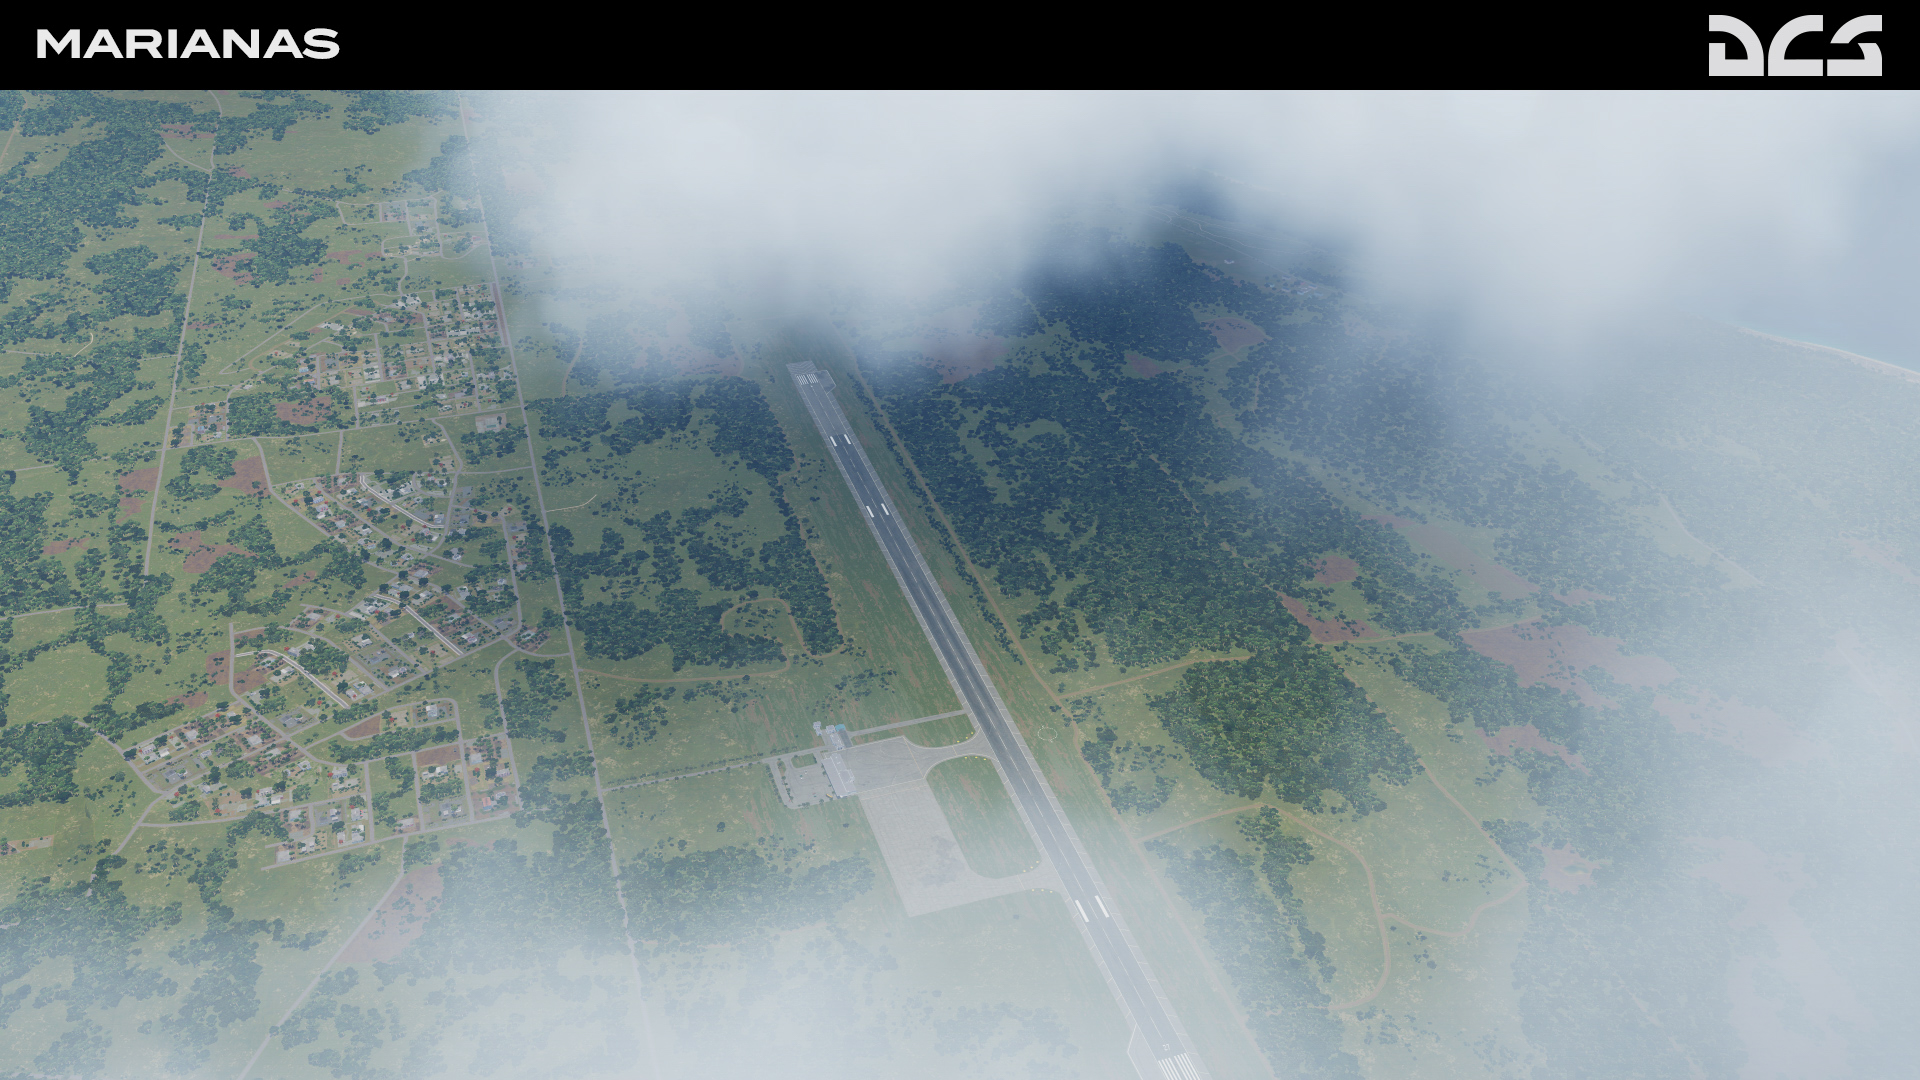 dcs-world-marianas-island-landing.jpg